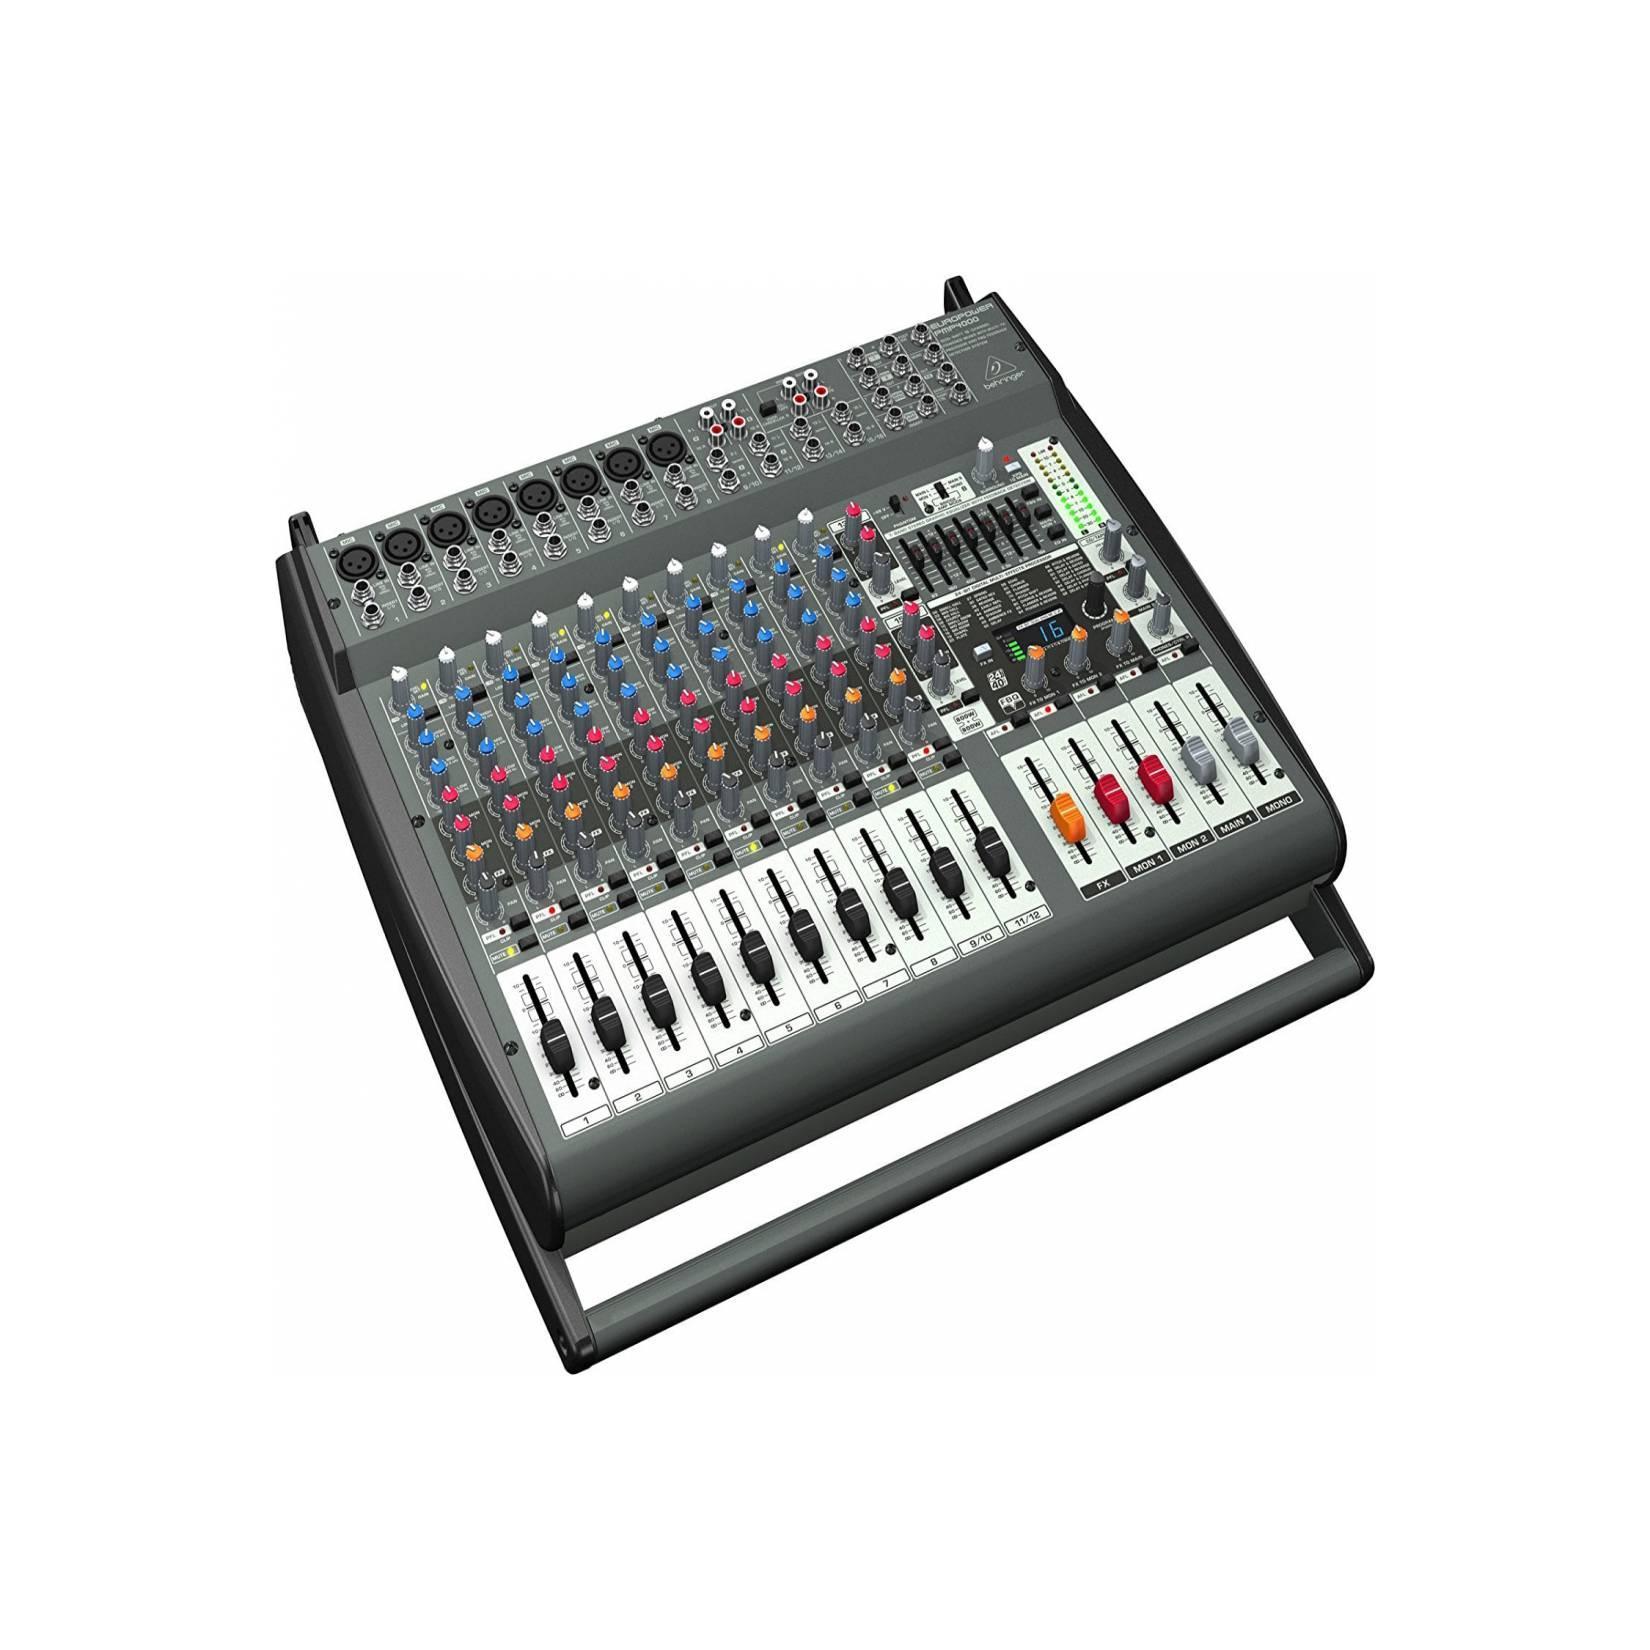 Behringer PMP4000 Power Mixer PMP 4000 promo murah original garansi